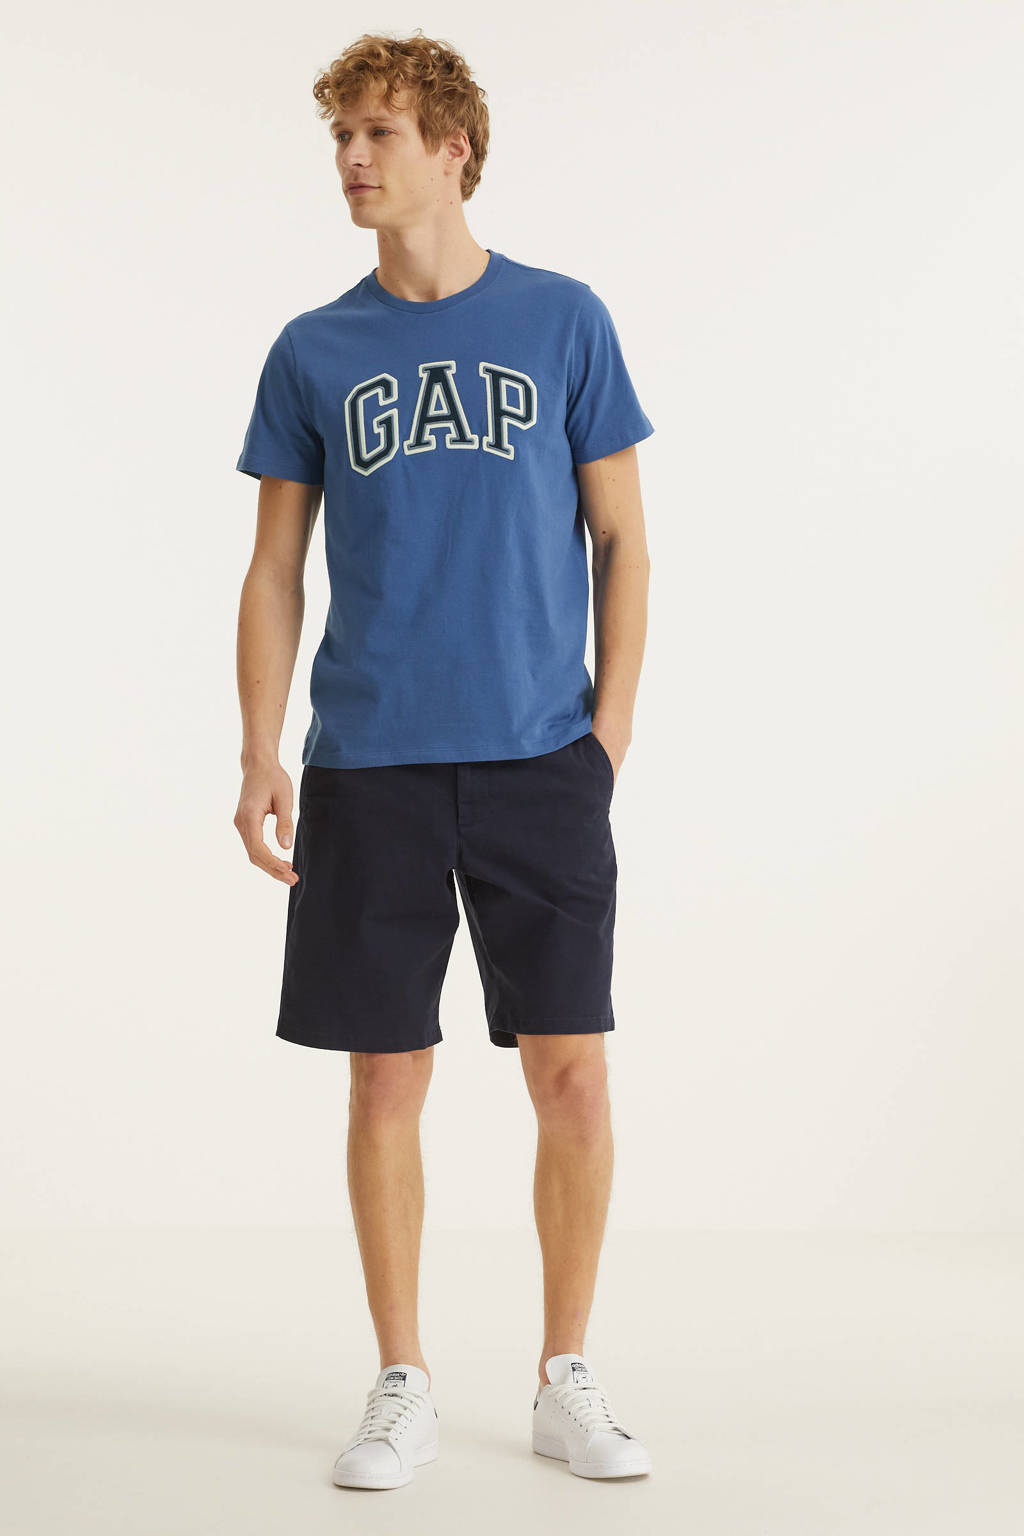 GAP T-shirt Bas Arch met logo blauw, Blauw